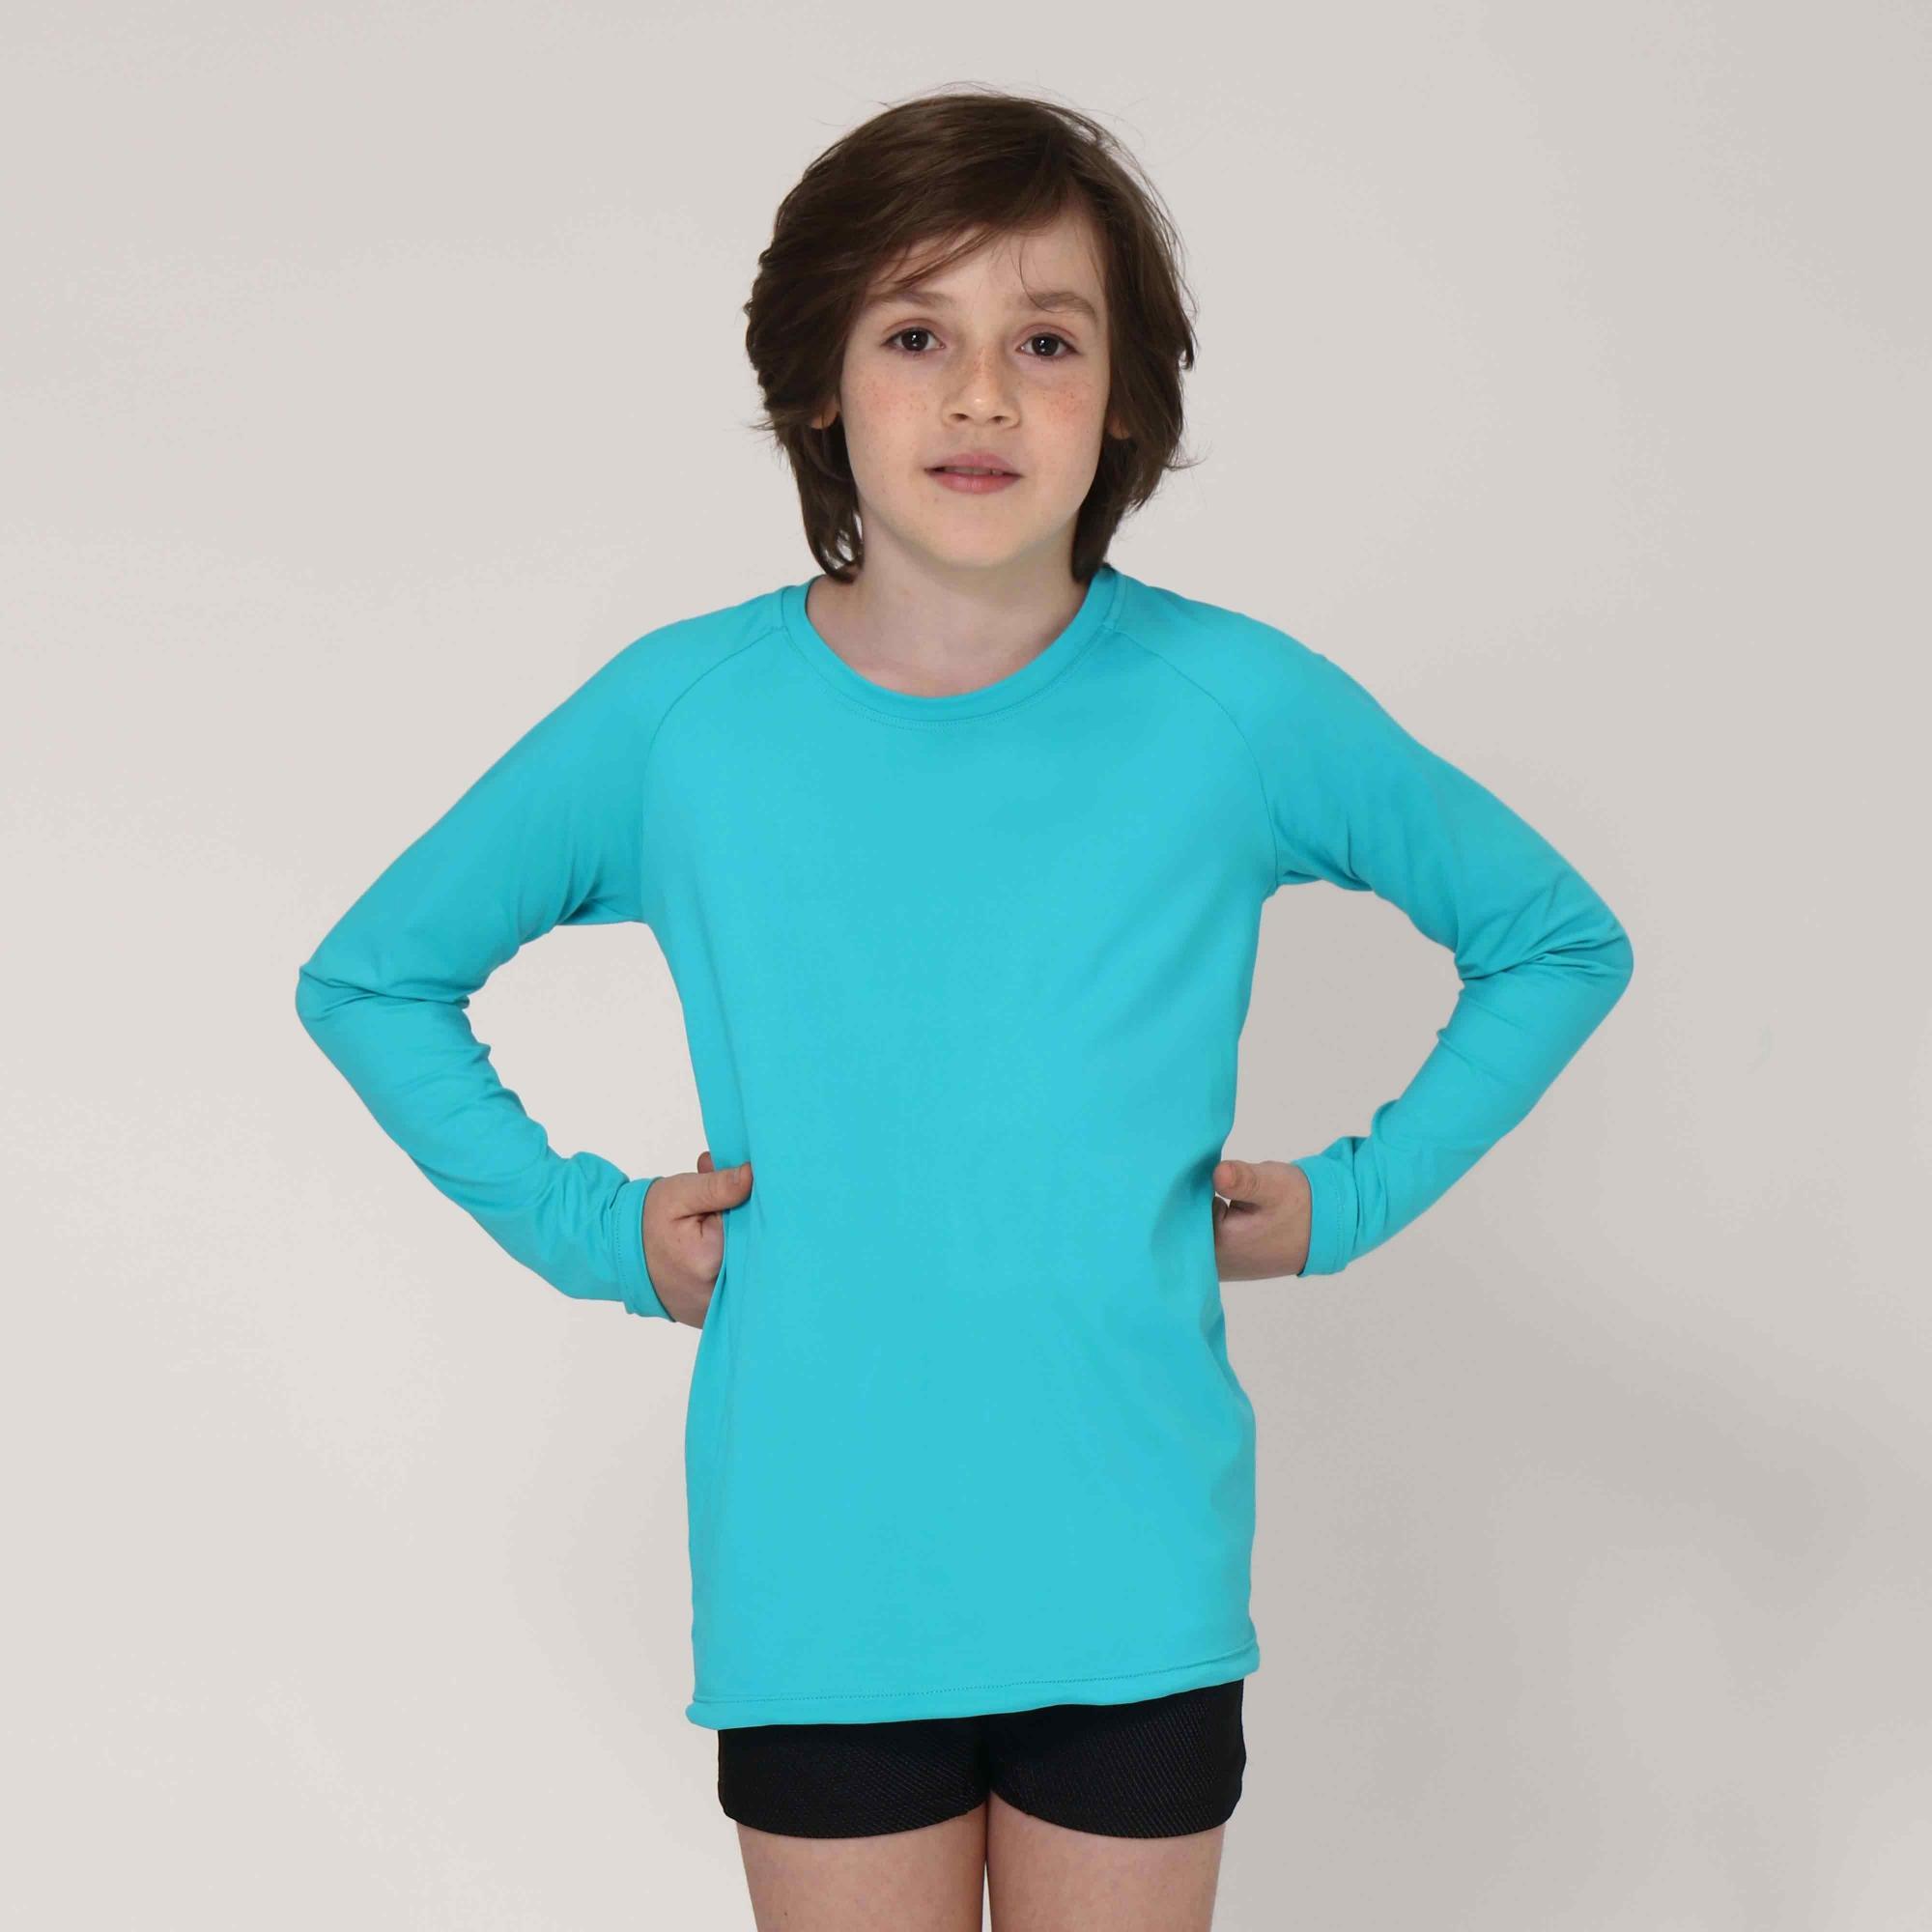 UV LINE Camiseta Acqua Prancha Manga Longa Infantil Turquesa Proteção Solar